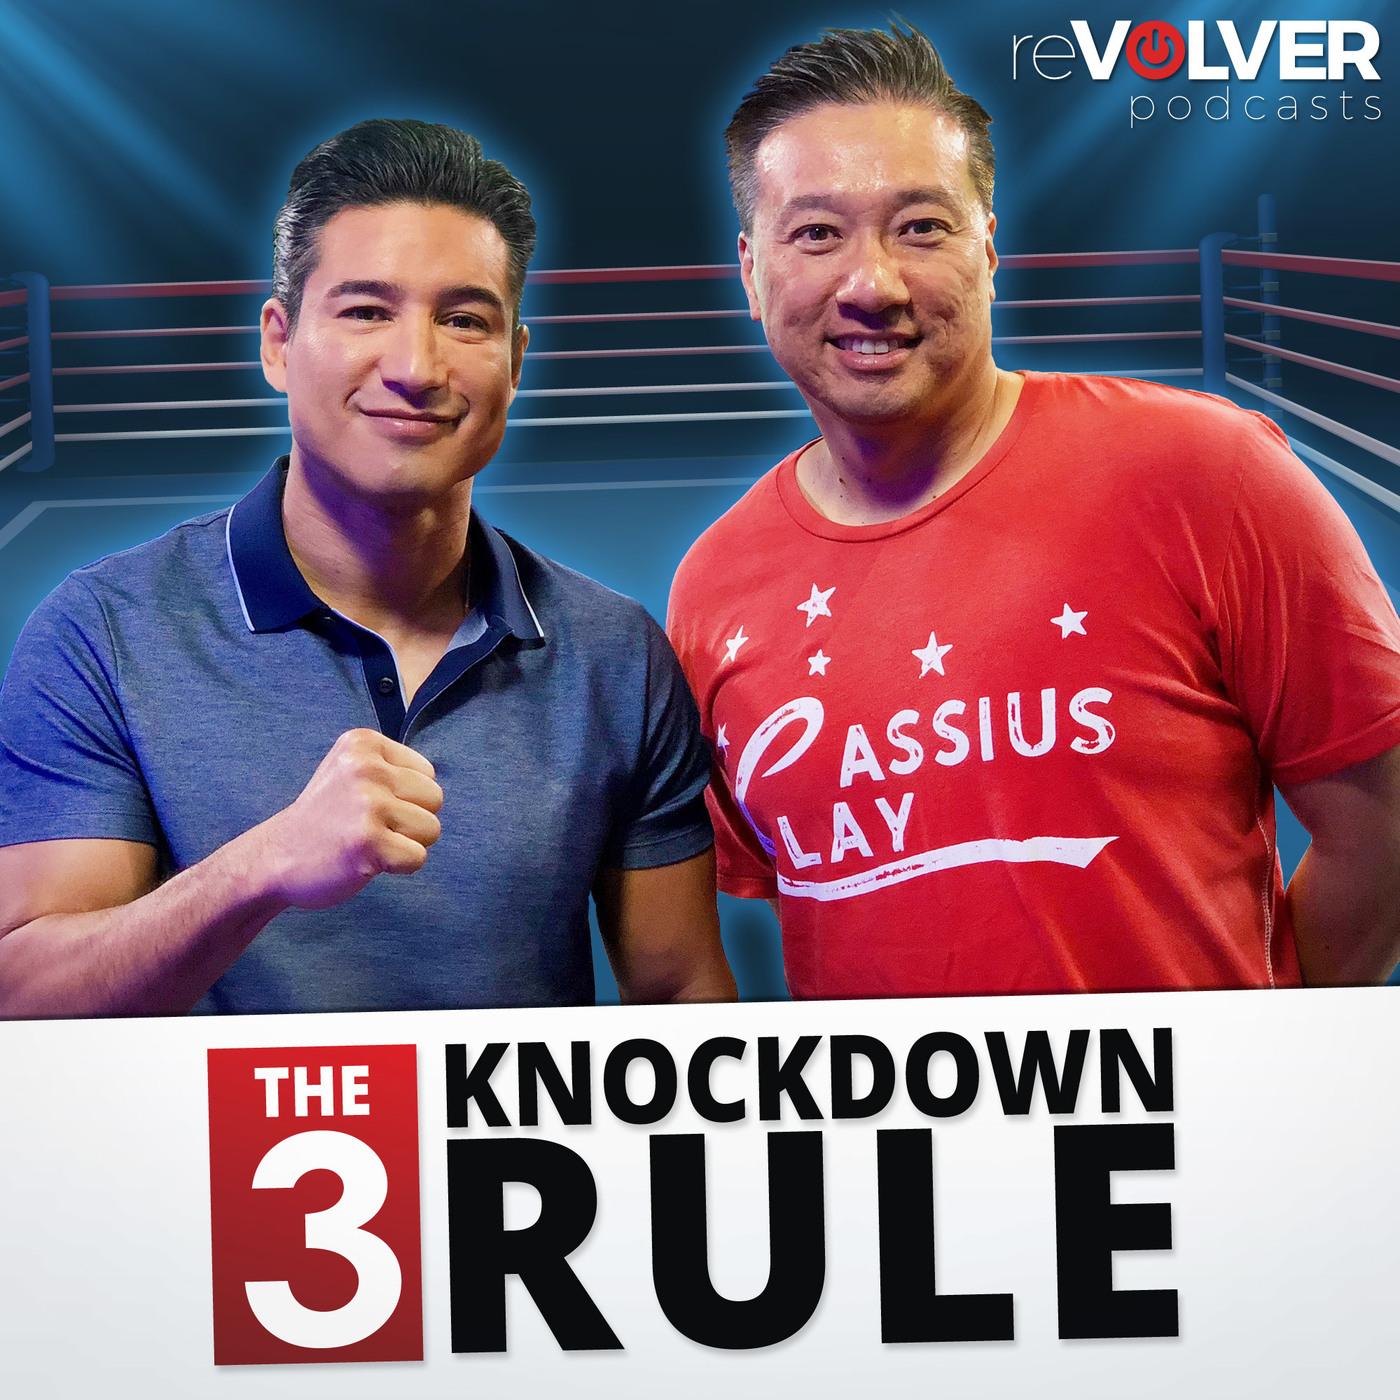 3KR: Canelo vs Kovalev Recap, Thoughts on DAZN delay, Inoue vs Donaire preview & more!